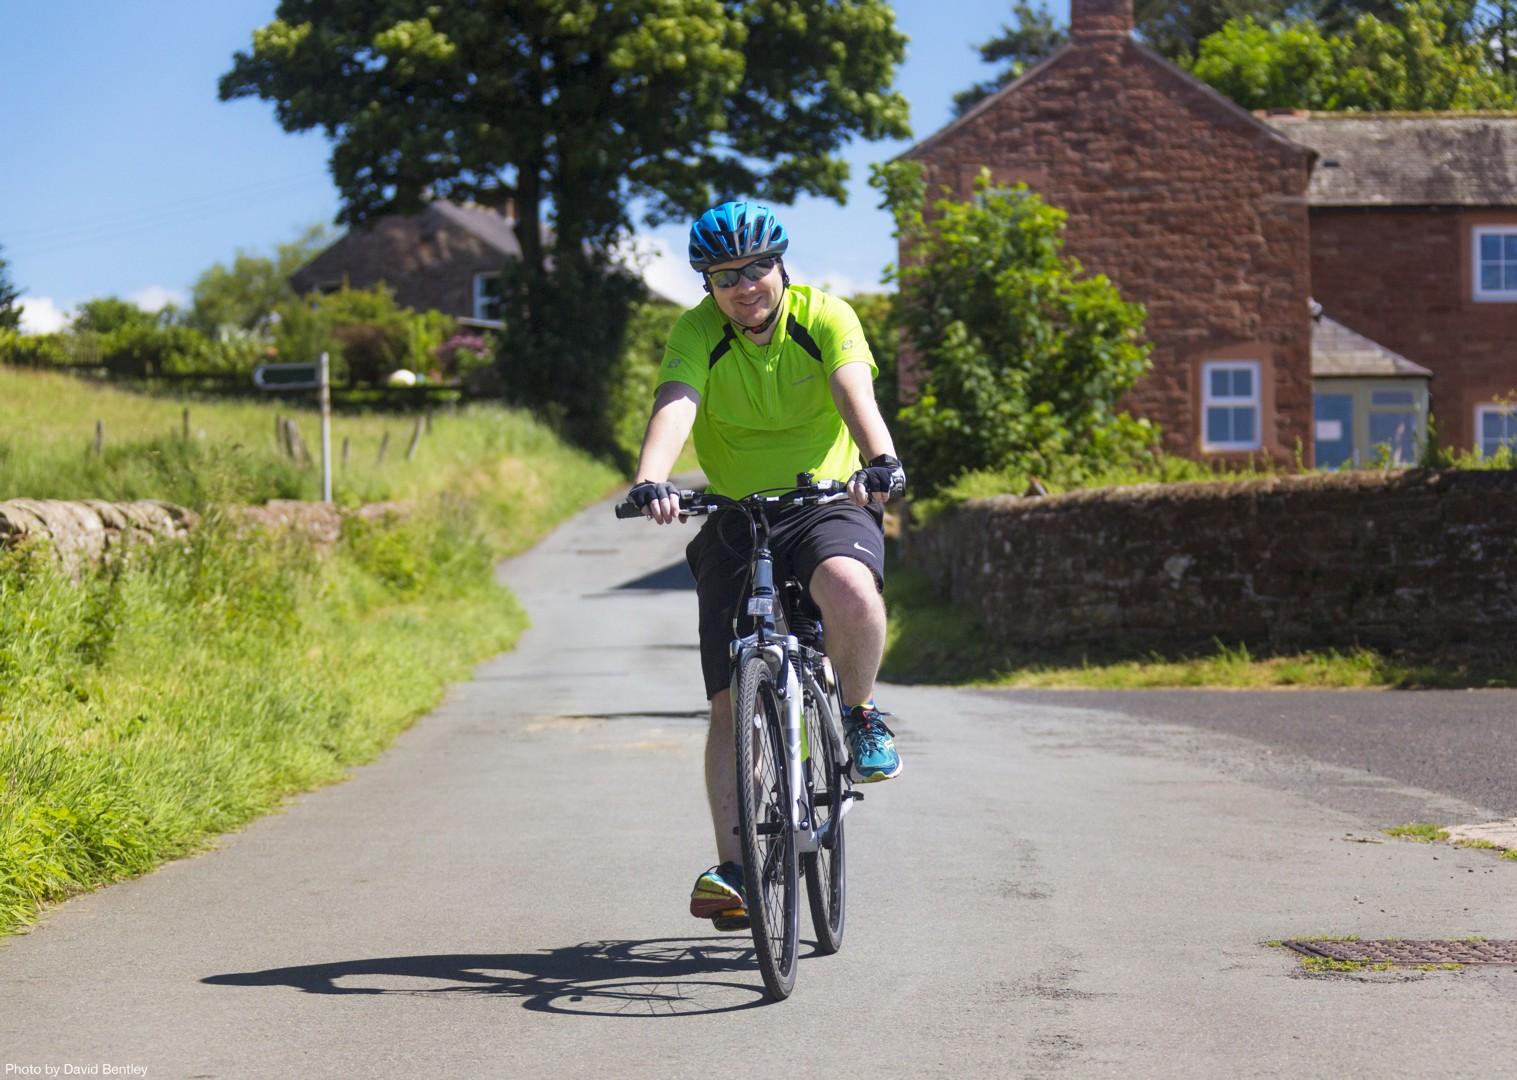 Cycle-Hadrians-Wall-UK-Hadrians-Cycleway-Self-Guided-Leisure-Cycling-Holiday.jpg - UK - Hadrian's Cycleway - 4 Days Cycling - Self-Guided Leisure Cycling Holiday - Leisure Cycling